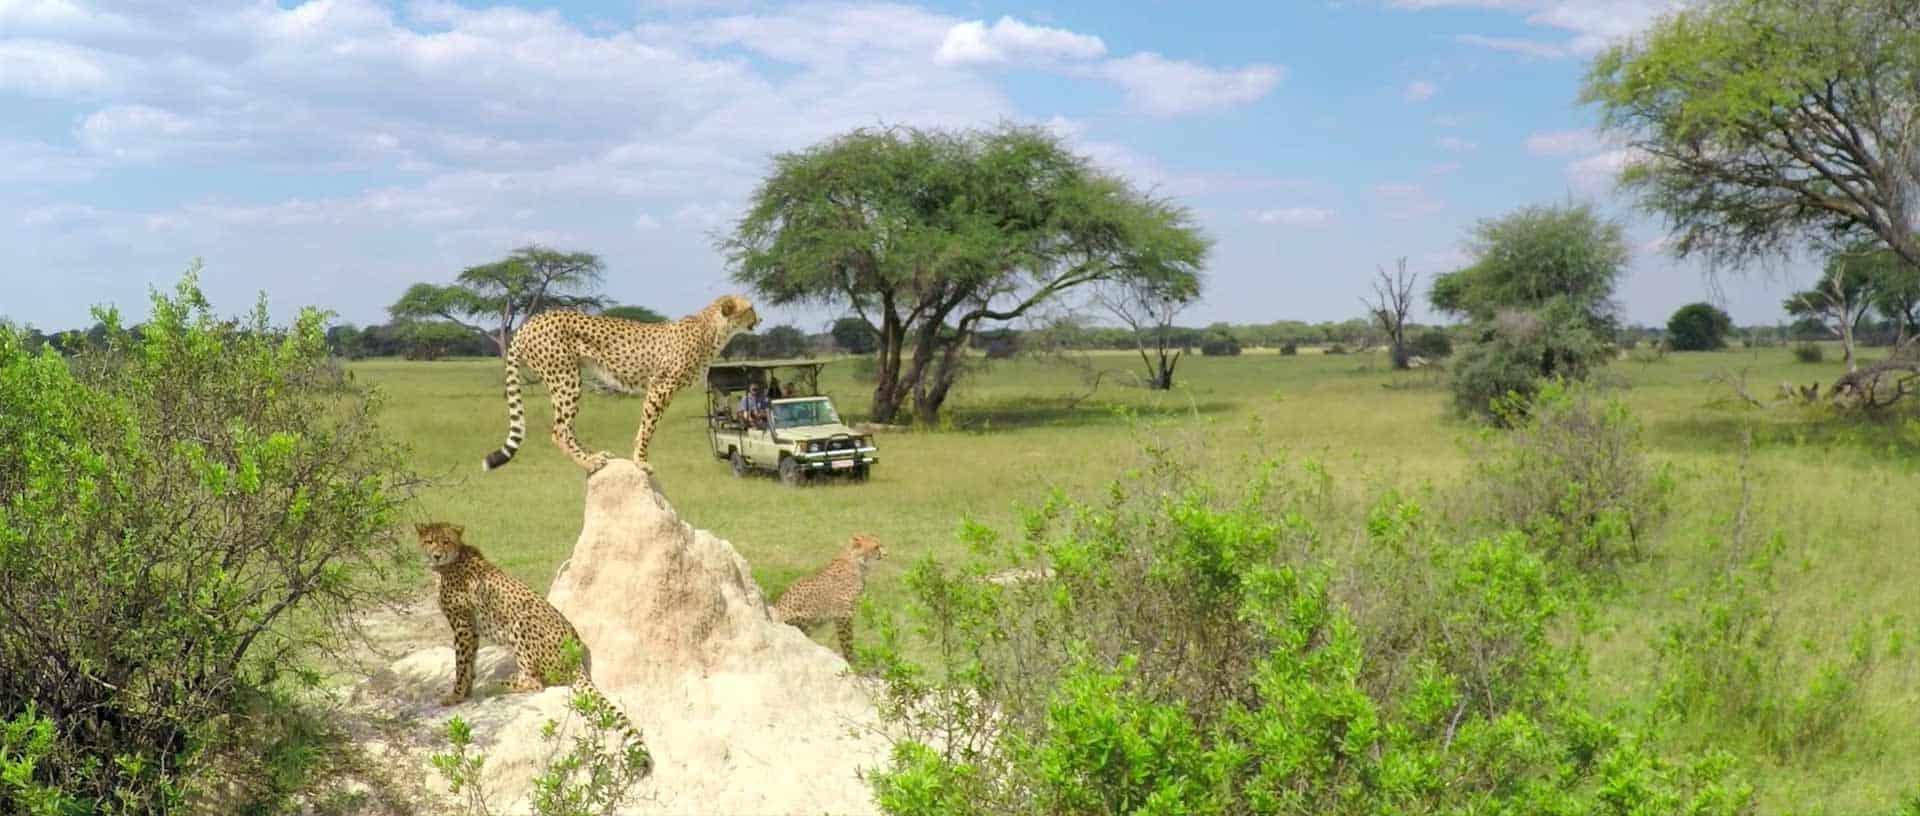 Wildlife at The Hide Cheetah